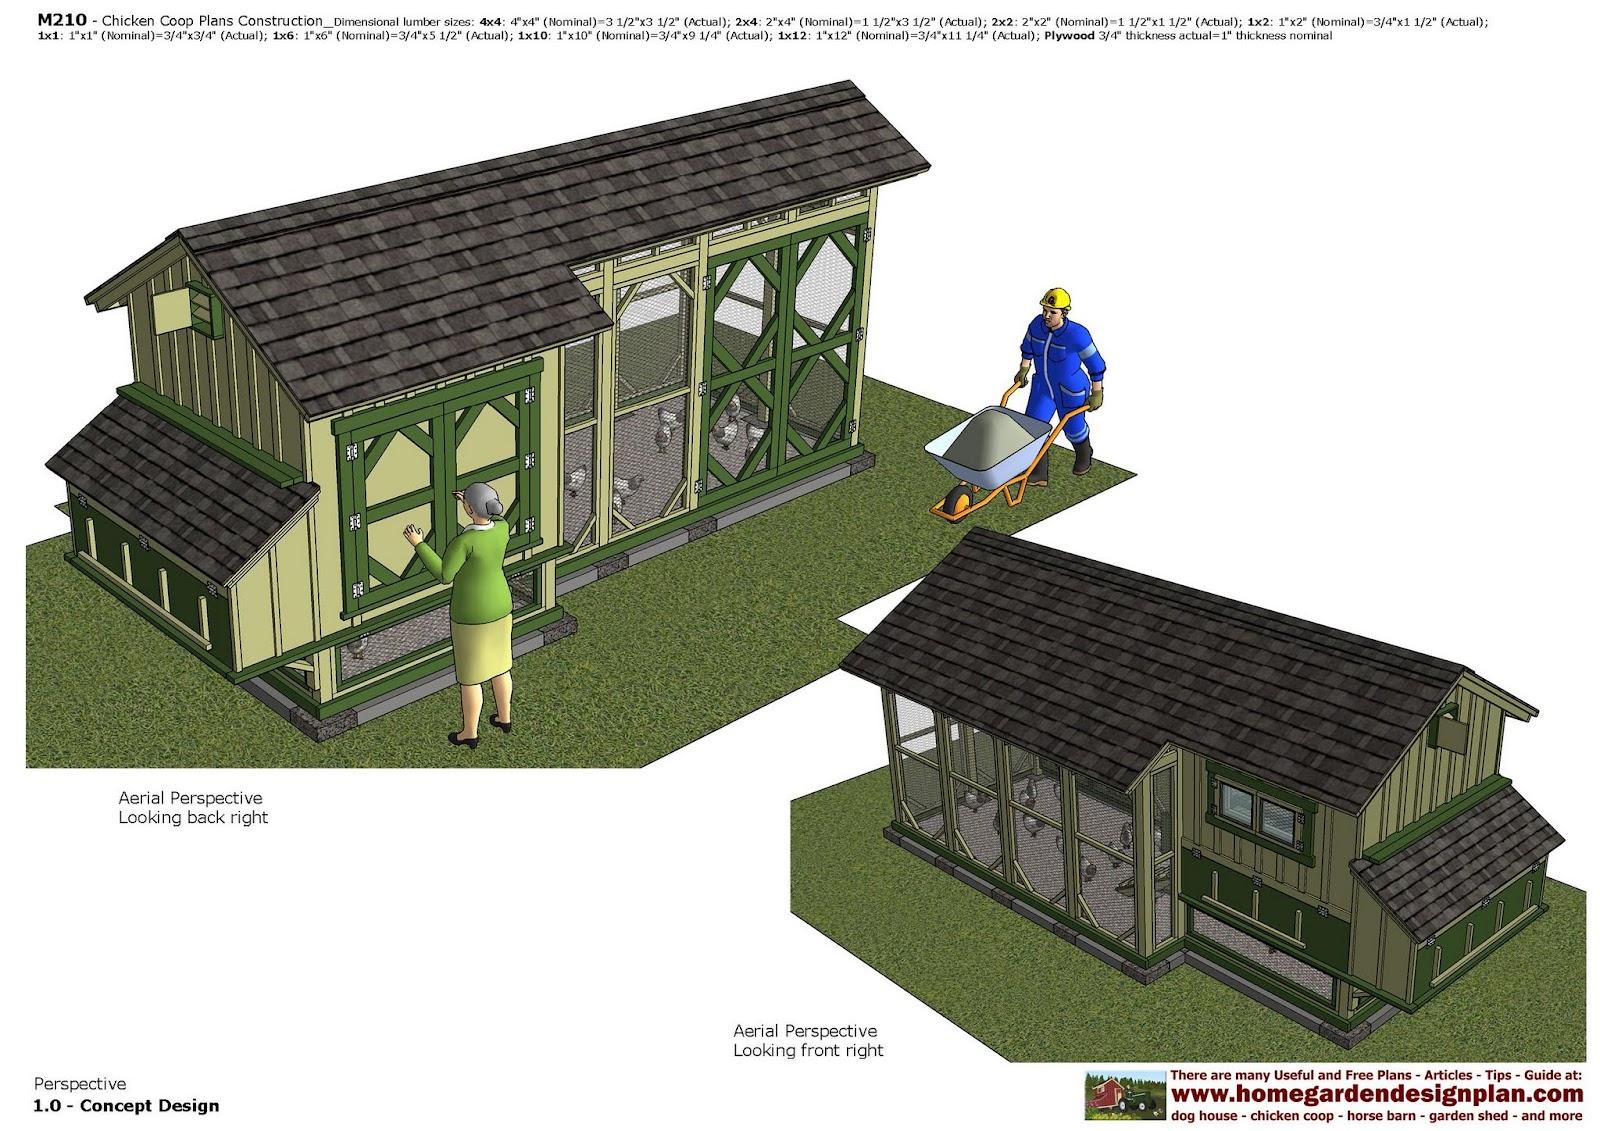 Alternating tread stair revit home design ideas - Country Backyard Design Ideas Free Home Design Ideas Images